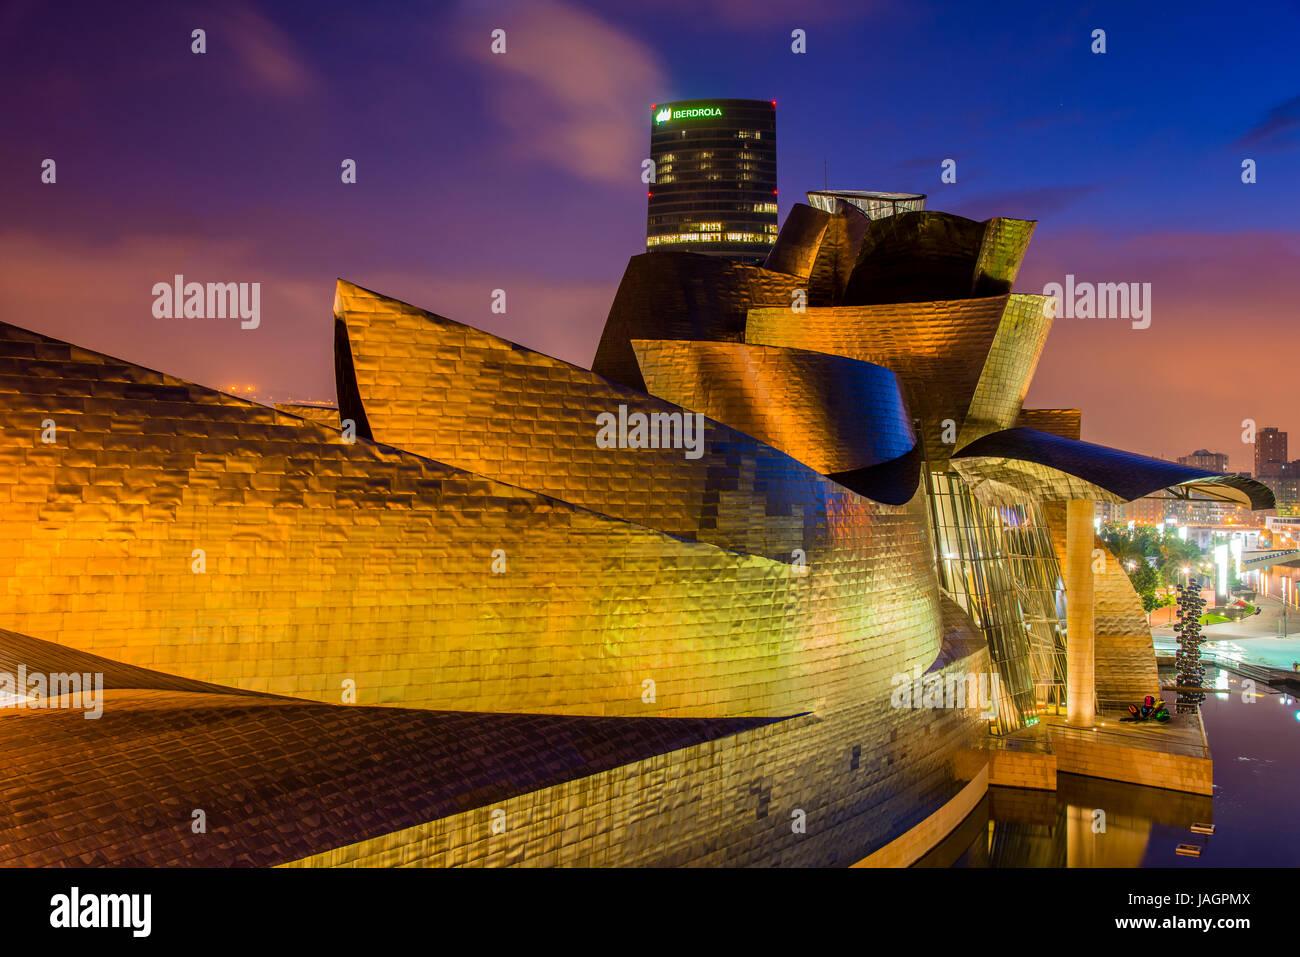 Guggenheim Museum by night, Bilbao, Basque Country, Spain - Stock Image